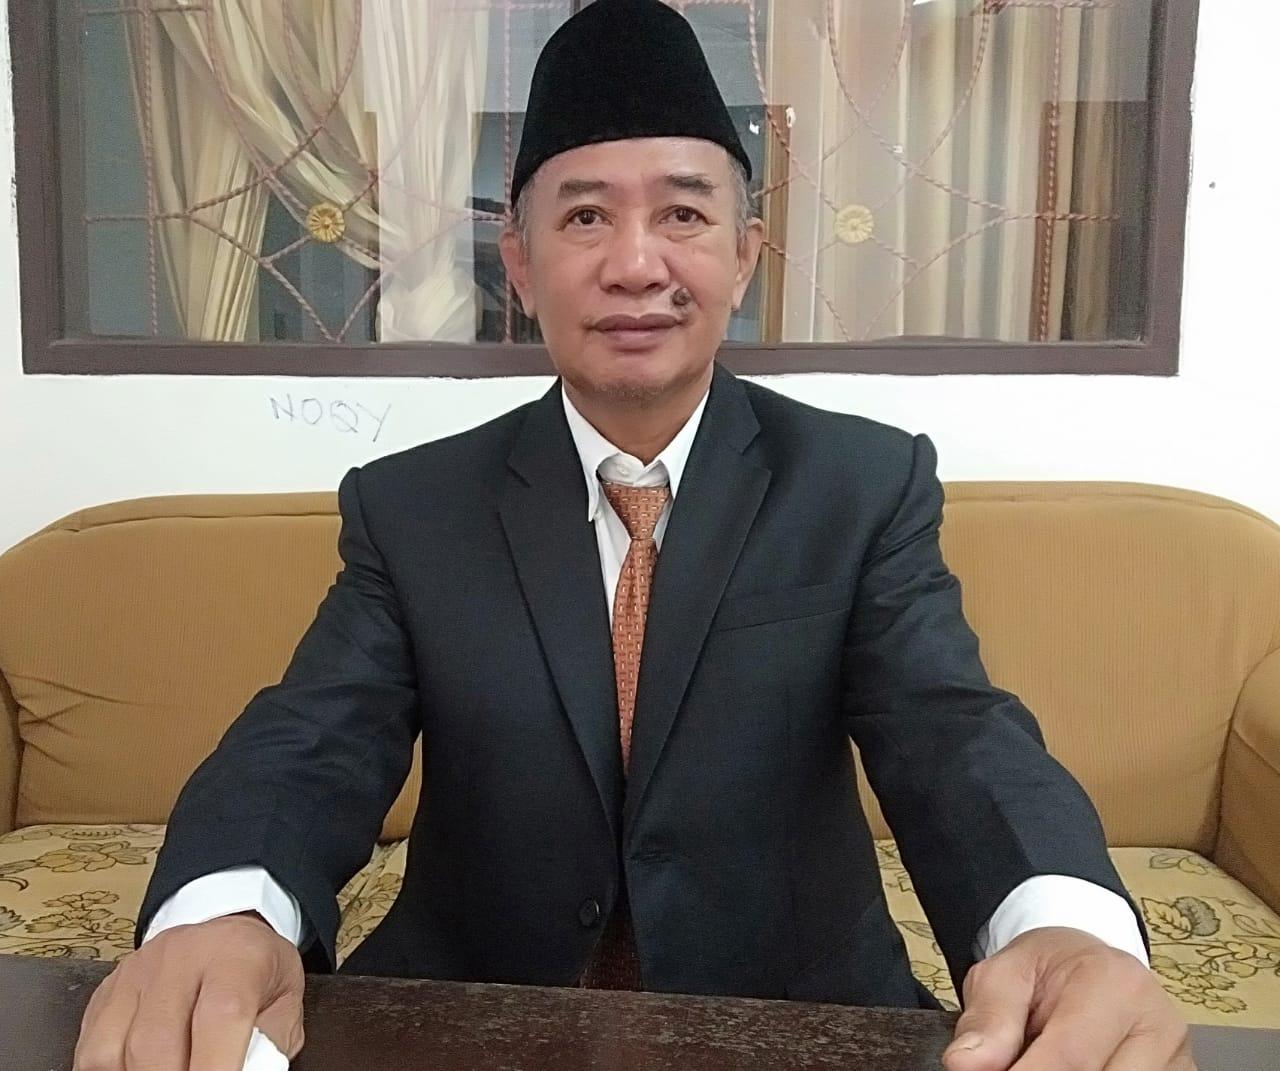 Ketgam : Anggota DPRD Konsel, Fraksi Nasdem Ir. H. Aharis Dapil 3 Kecamatan Baito, Palangga, Palangga Selatan, Lainea, Laeya, Wolasi dan Konda